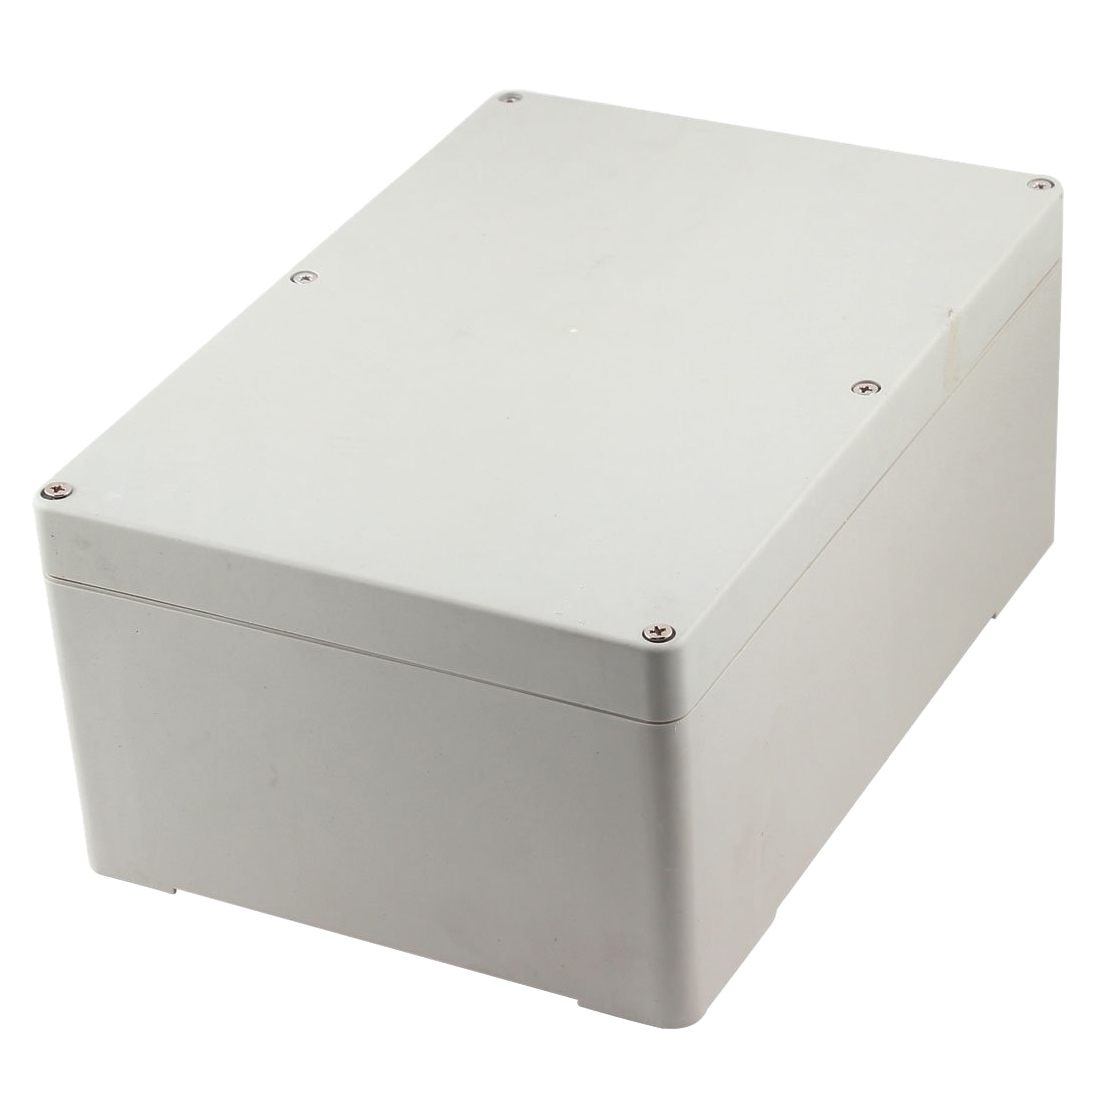 Waterproof Plastic Enclosure Case Junction Box 265mm x 185mm x 115mm